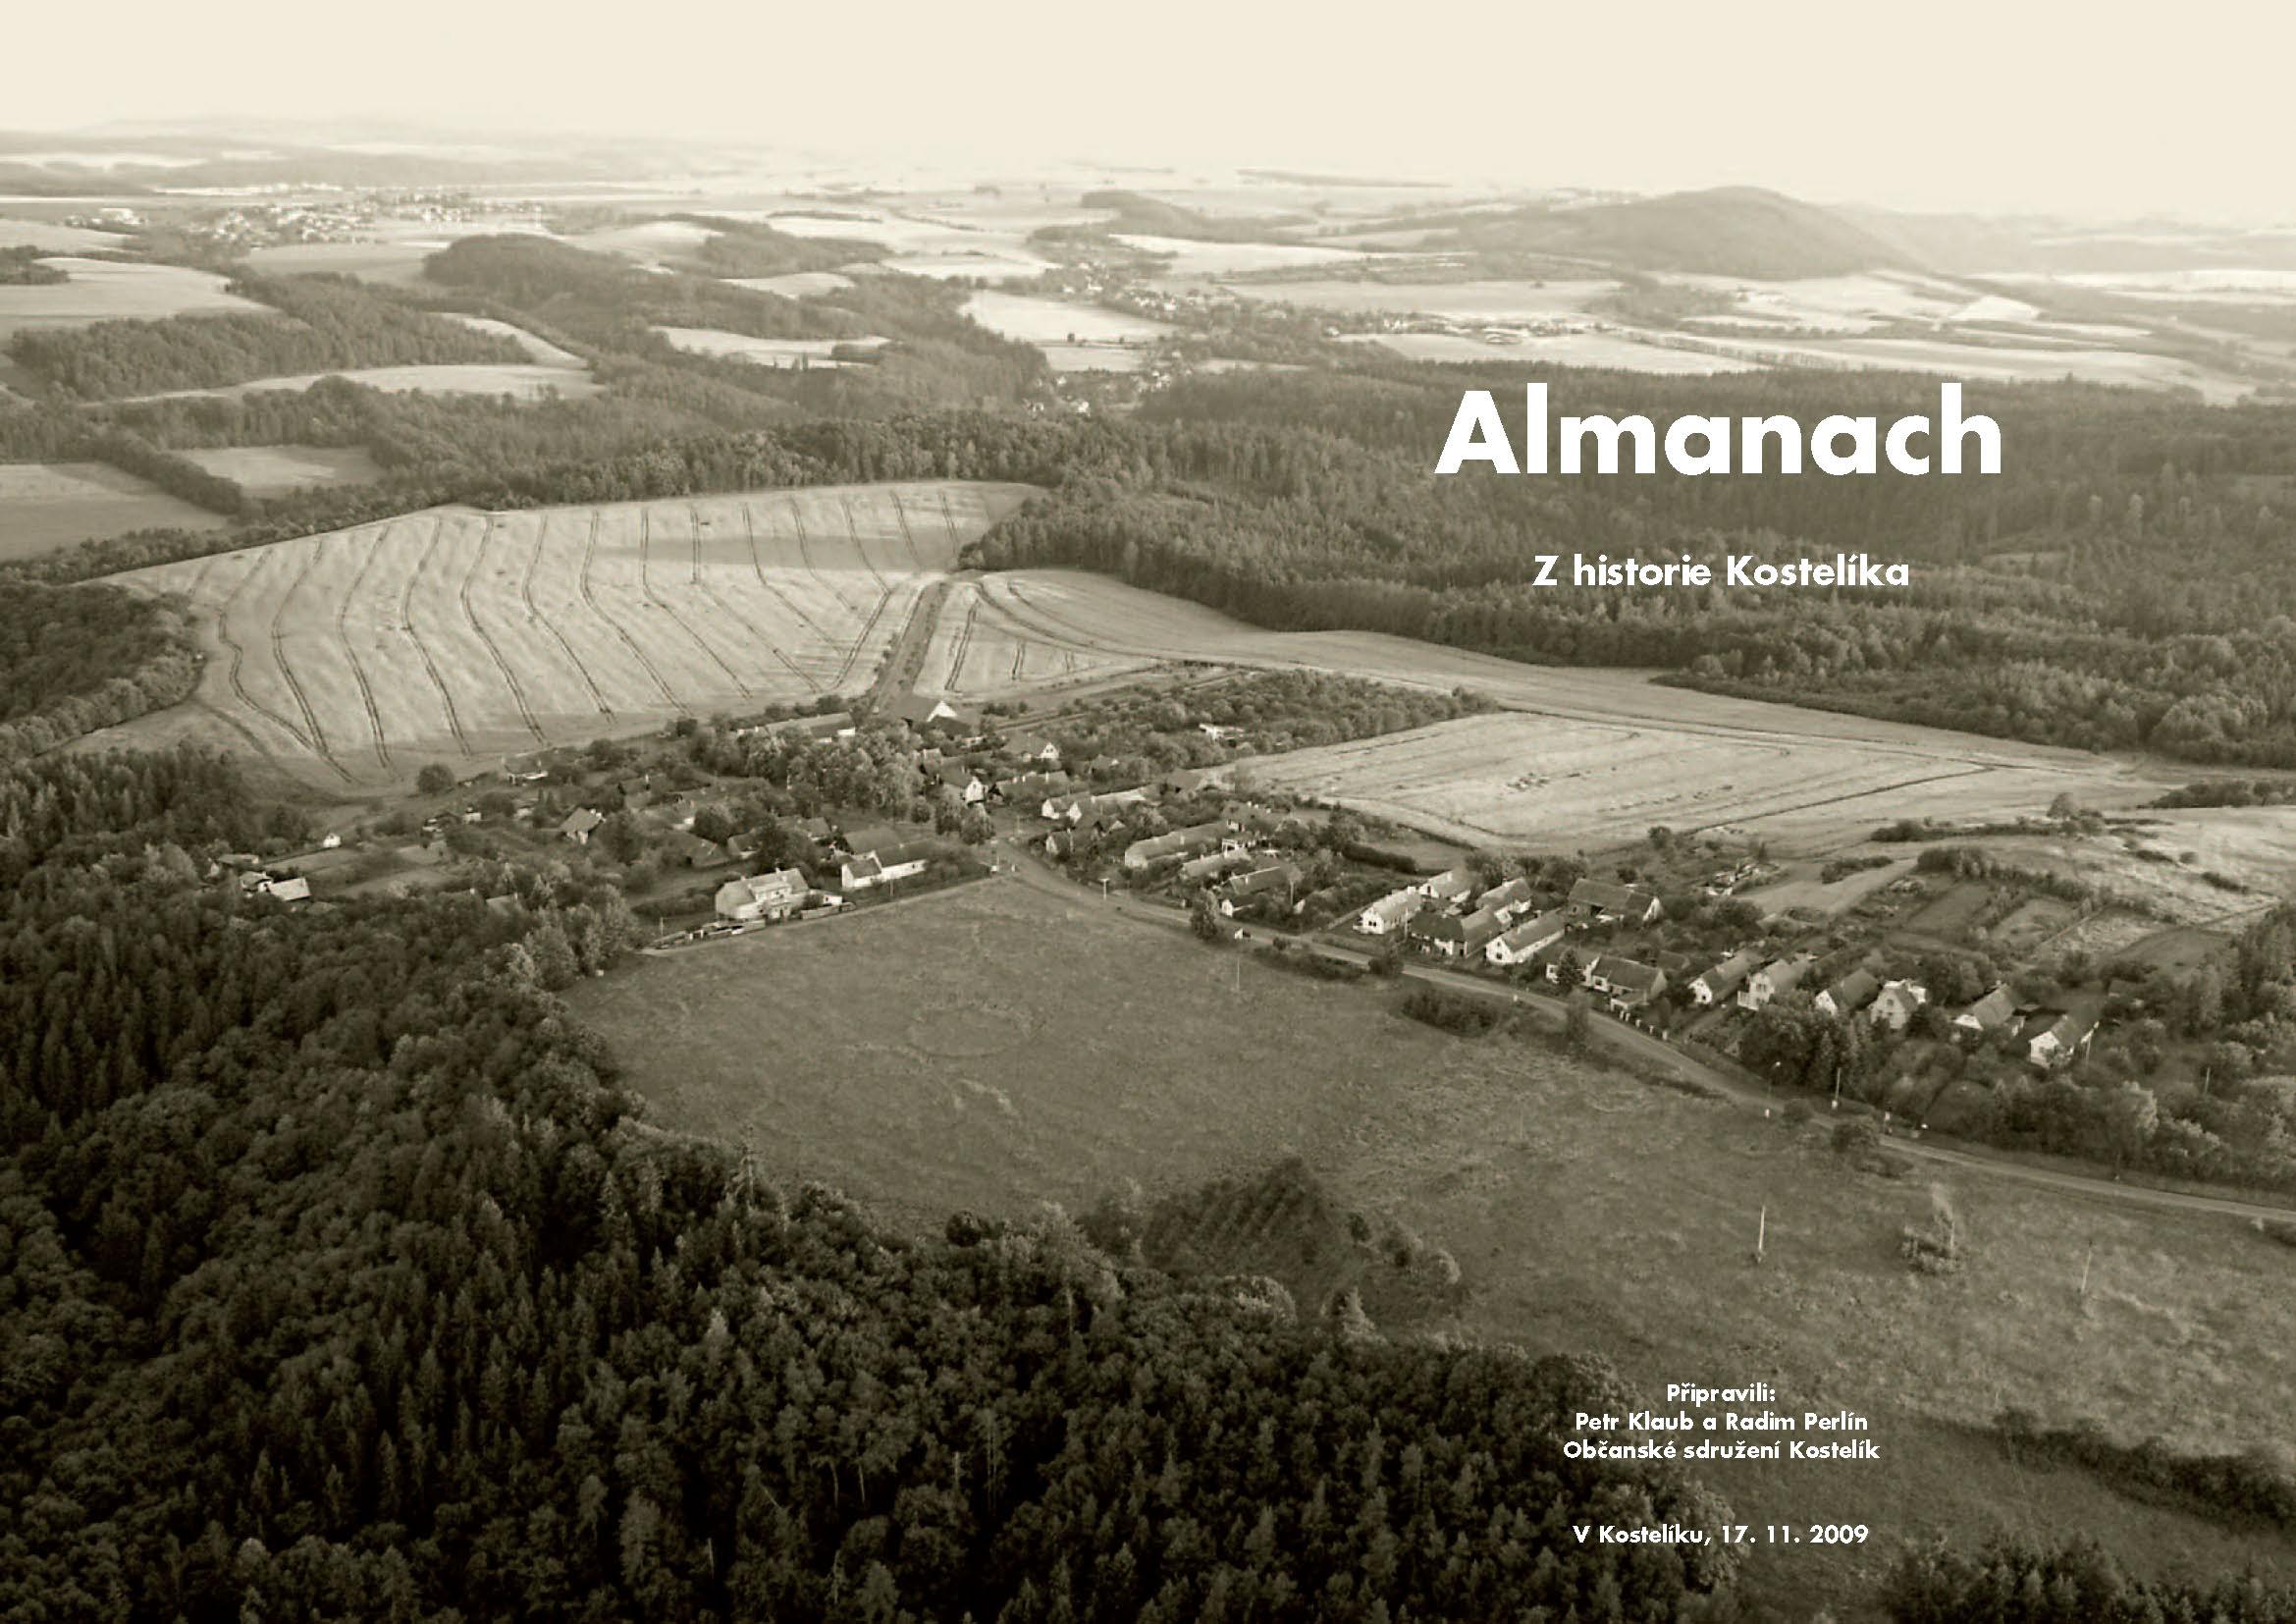 kostelik-almanach-obalka